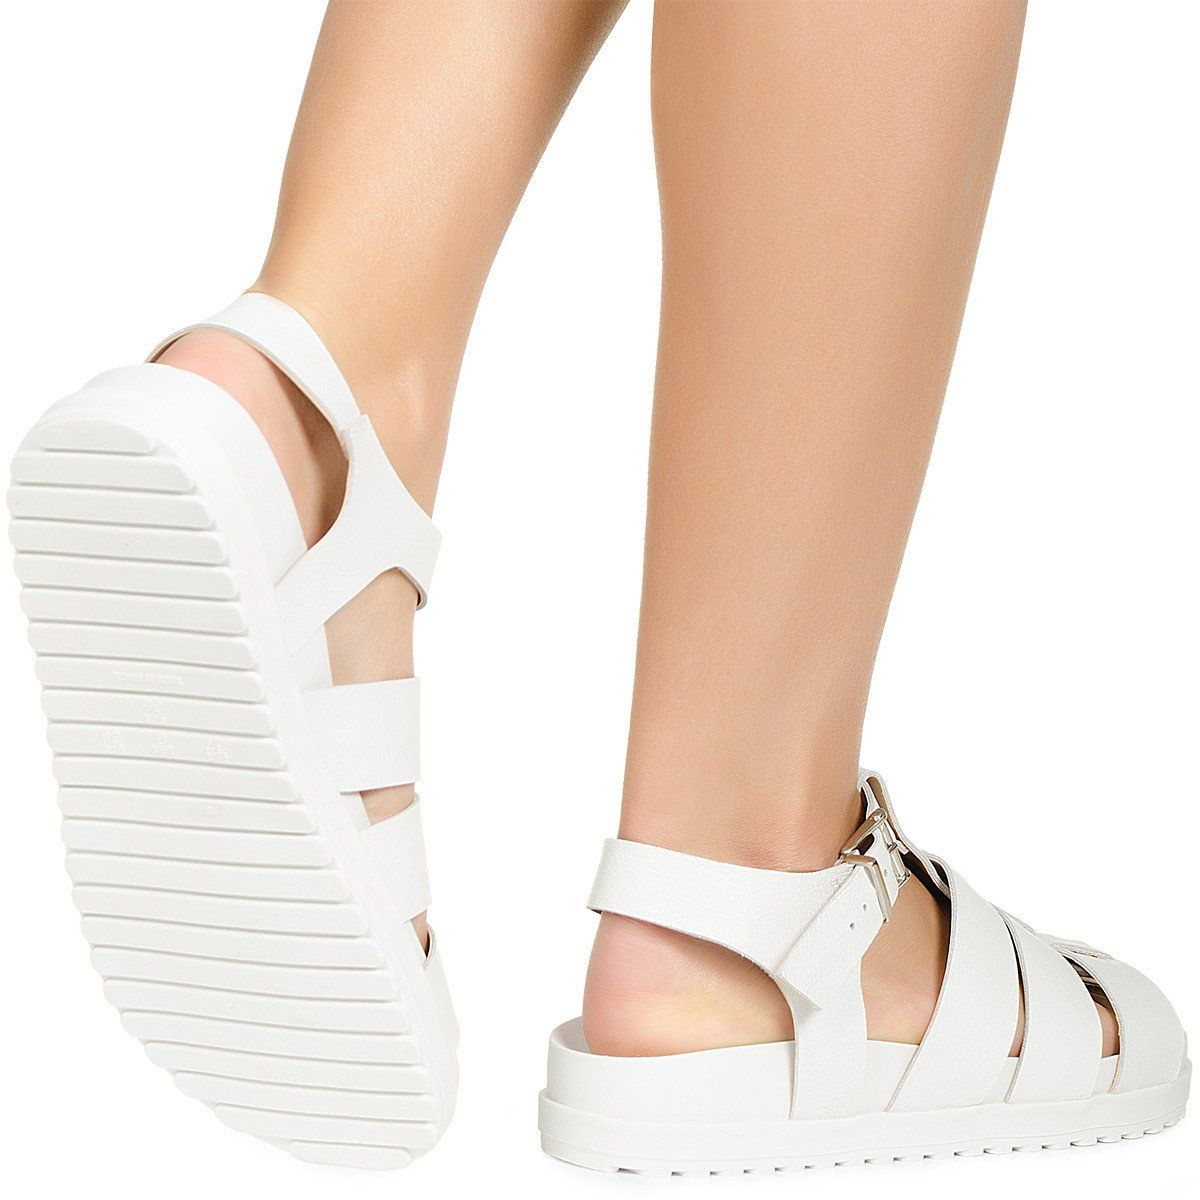 e9bfbe4058 Sandália flatform branca Taquilla - Taquilla - Loja online de sapatos  femininos